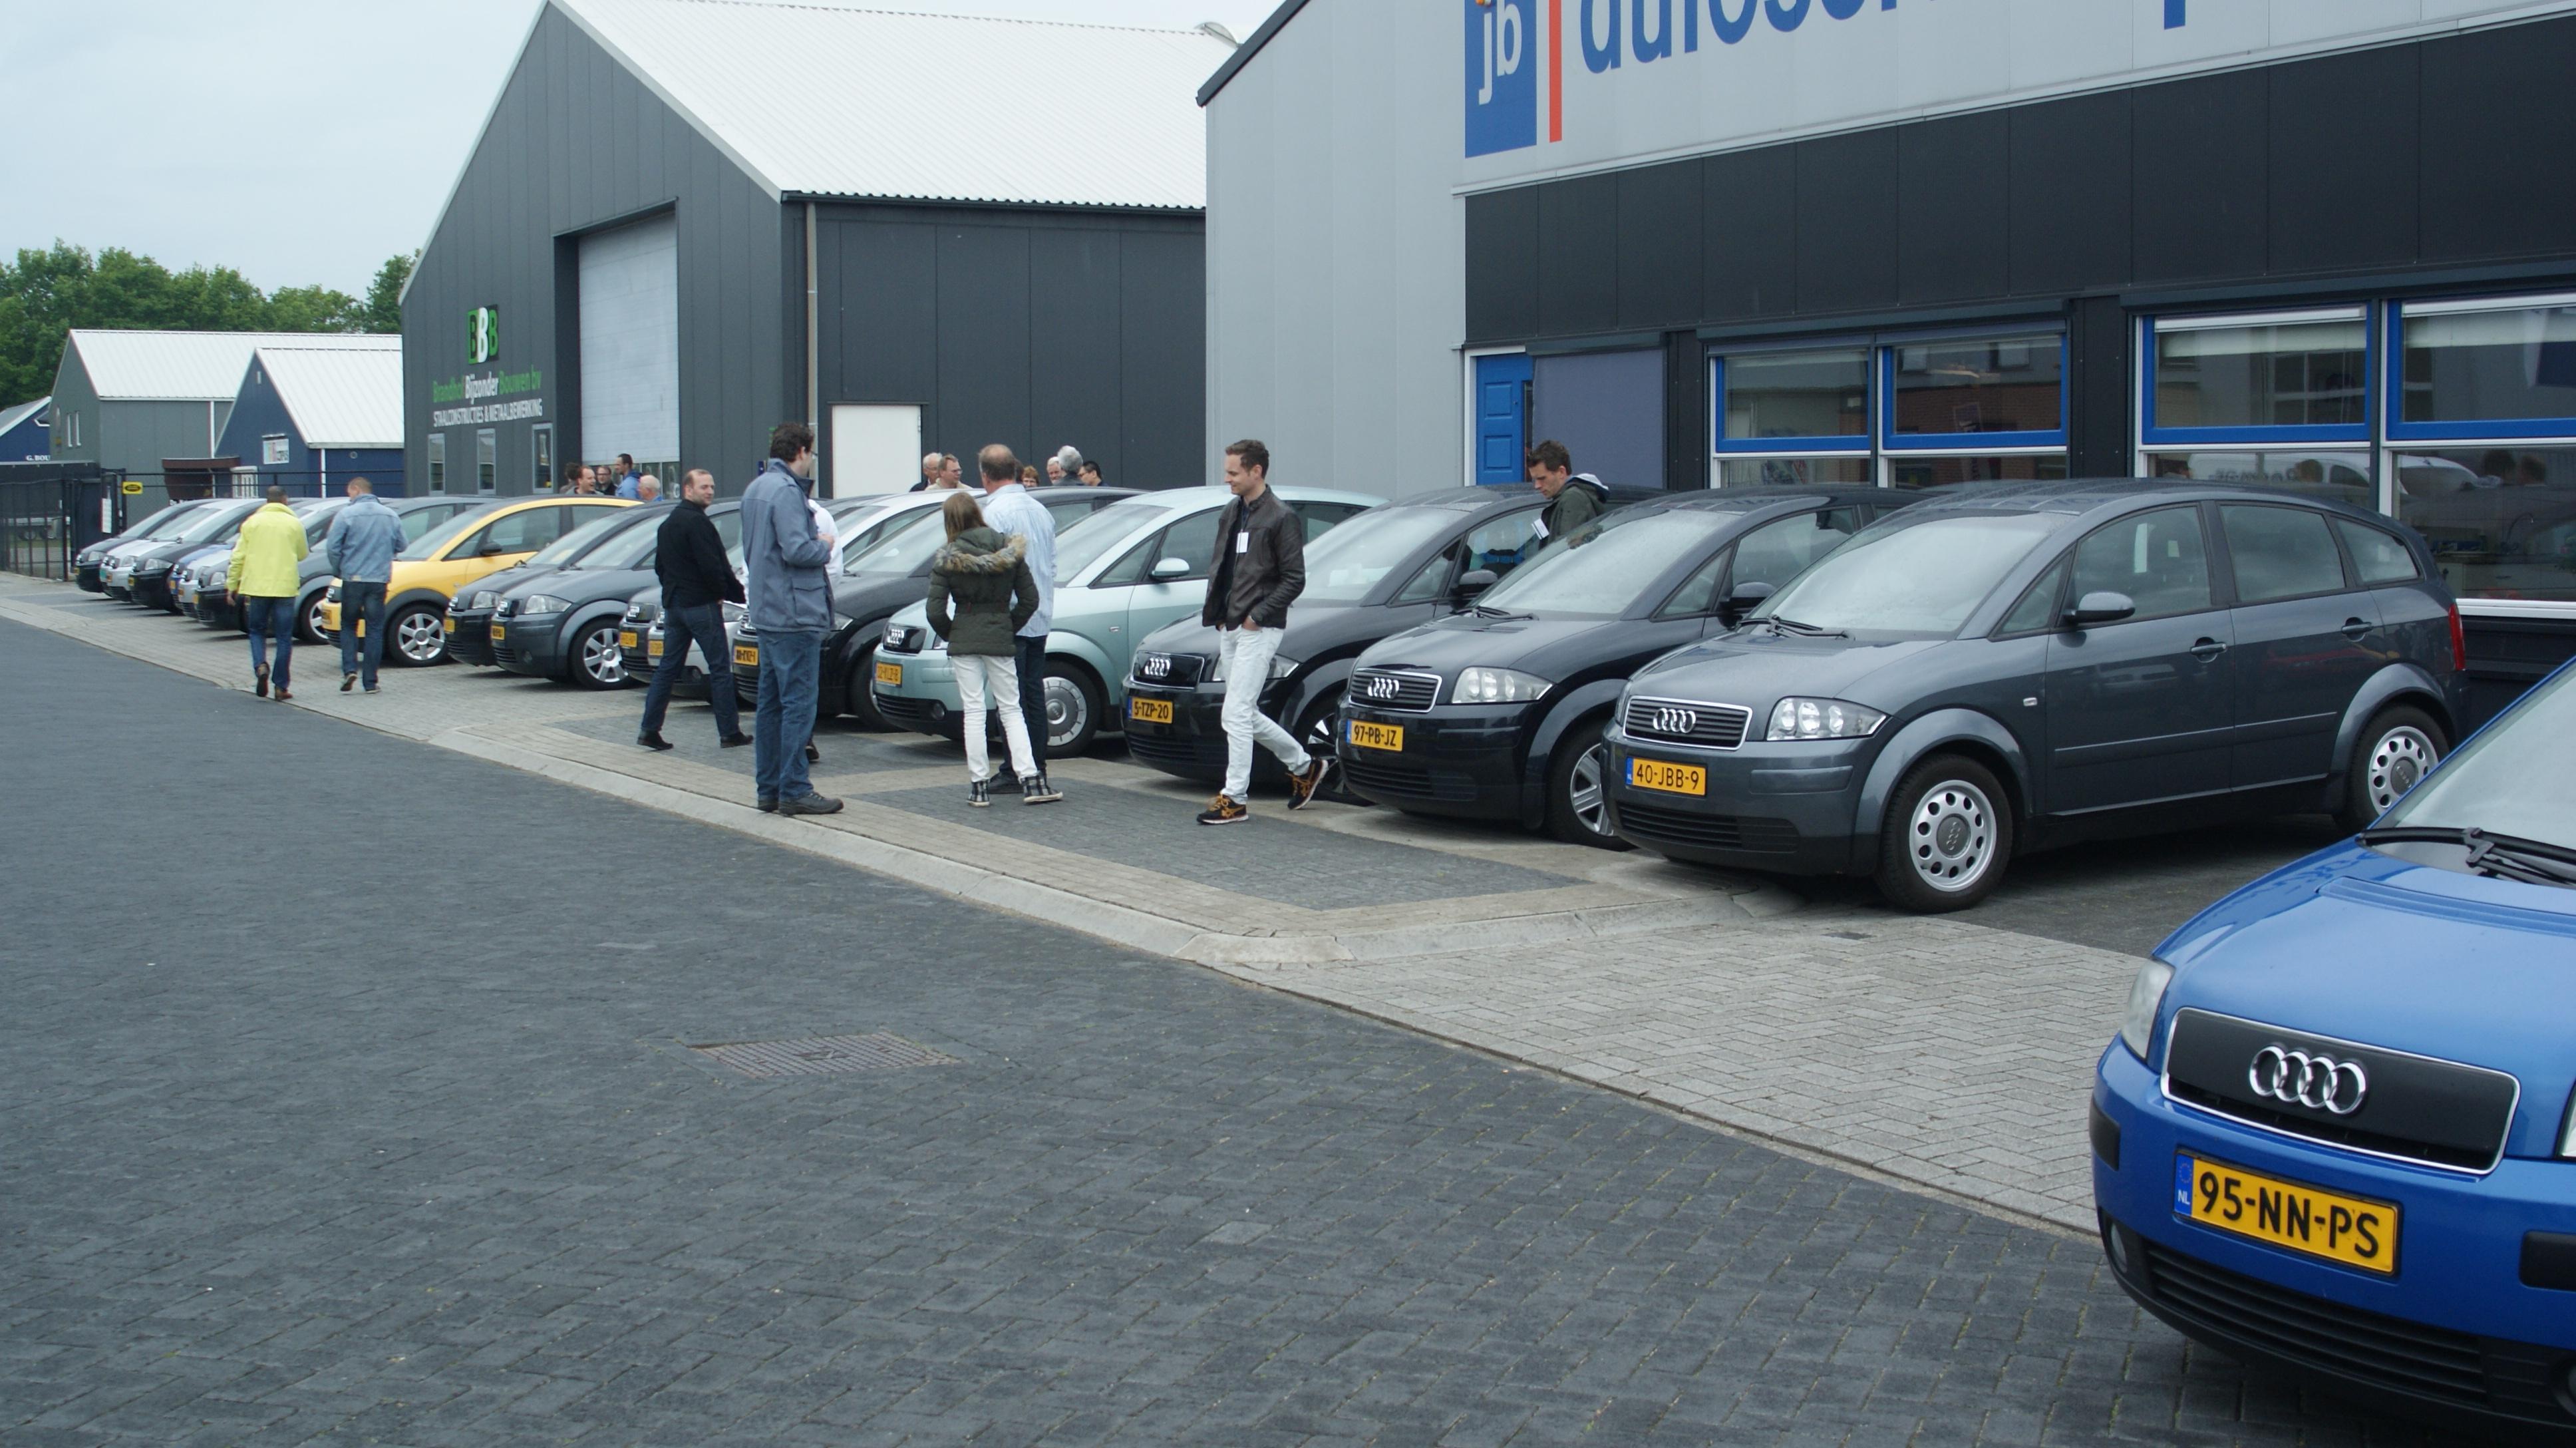 Audi A2 http://www.audi-a2.nl/ meeting 31-5-2015